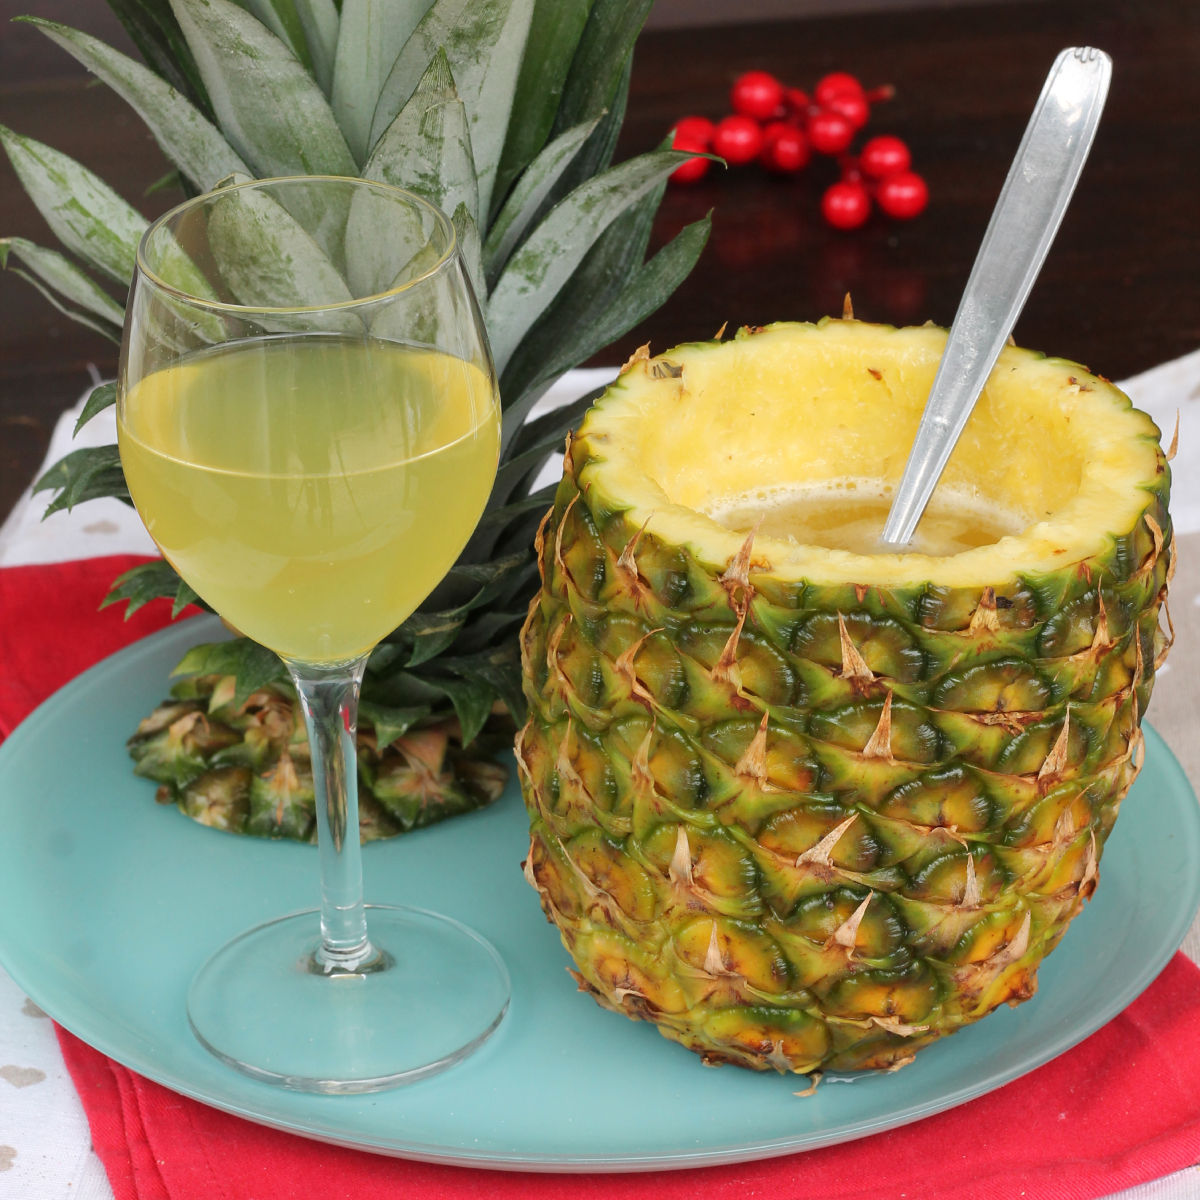 COCKTAIL CON ANANAS cocktail con succo ananas | ricetta aperitivo